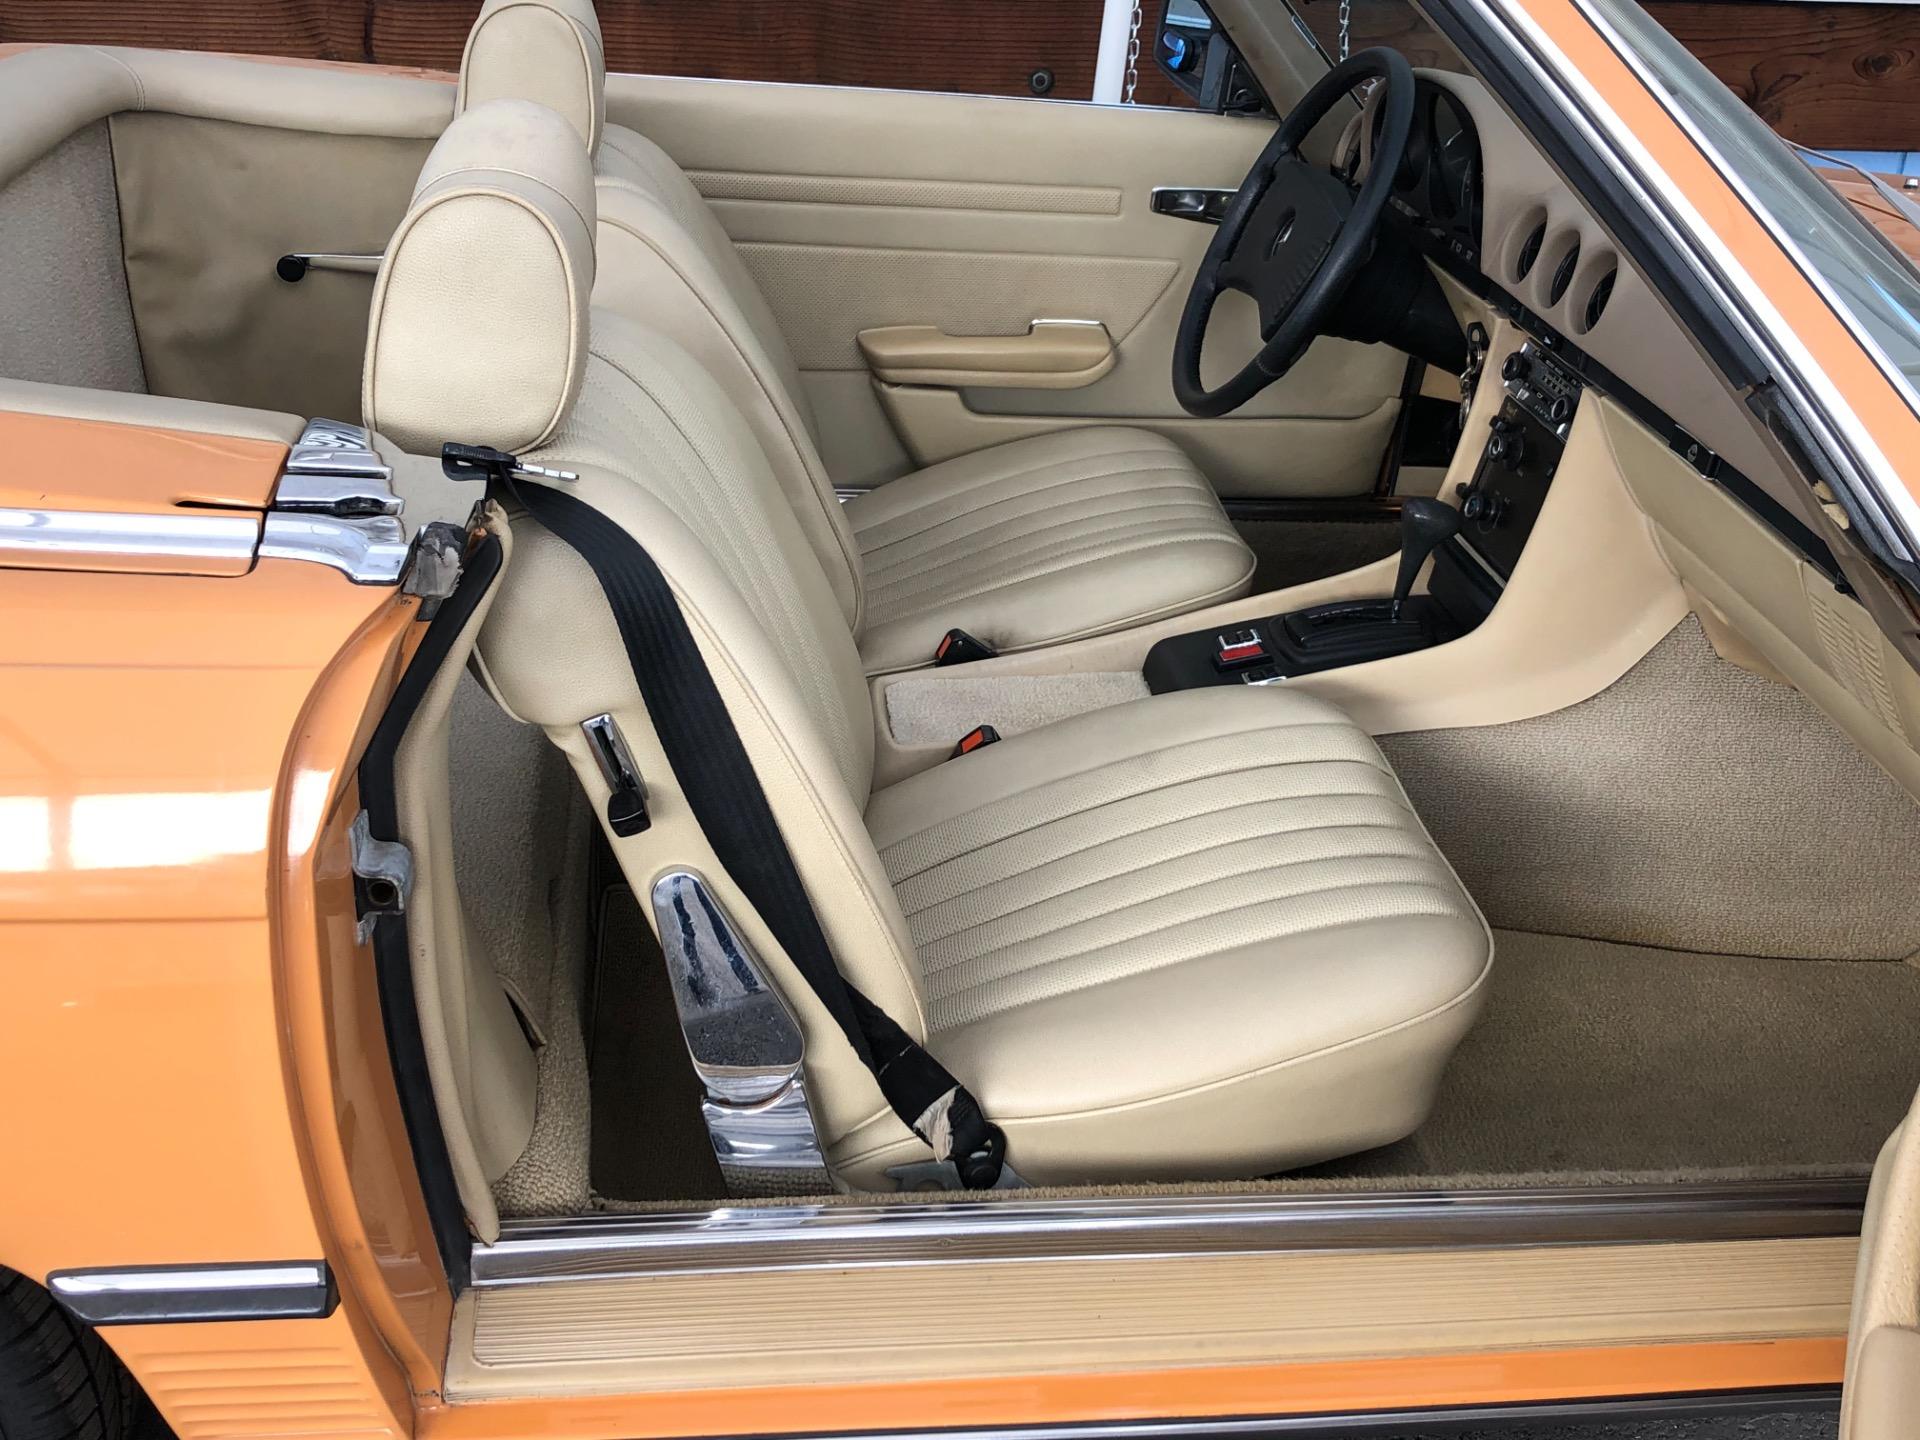 New 1976 Mercedes Benz 450 Class 450 SL